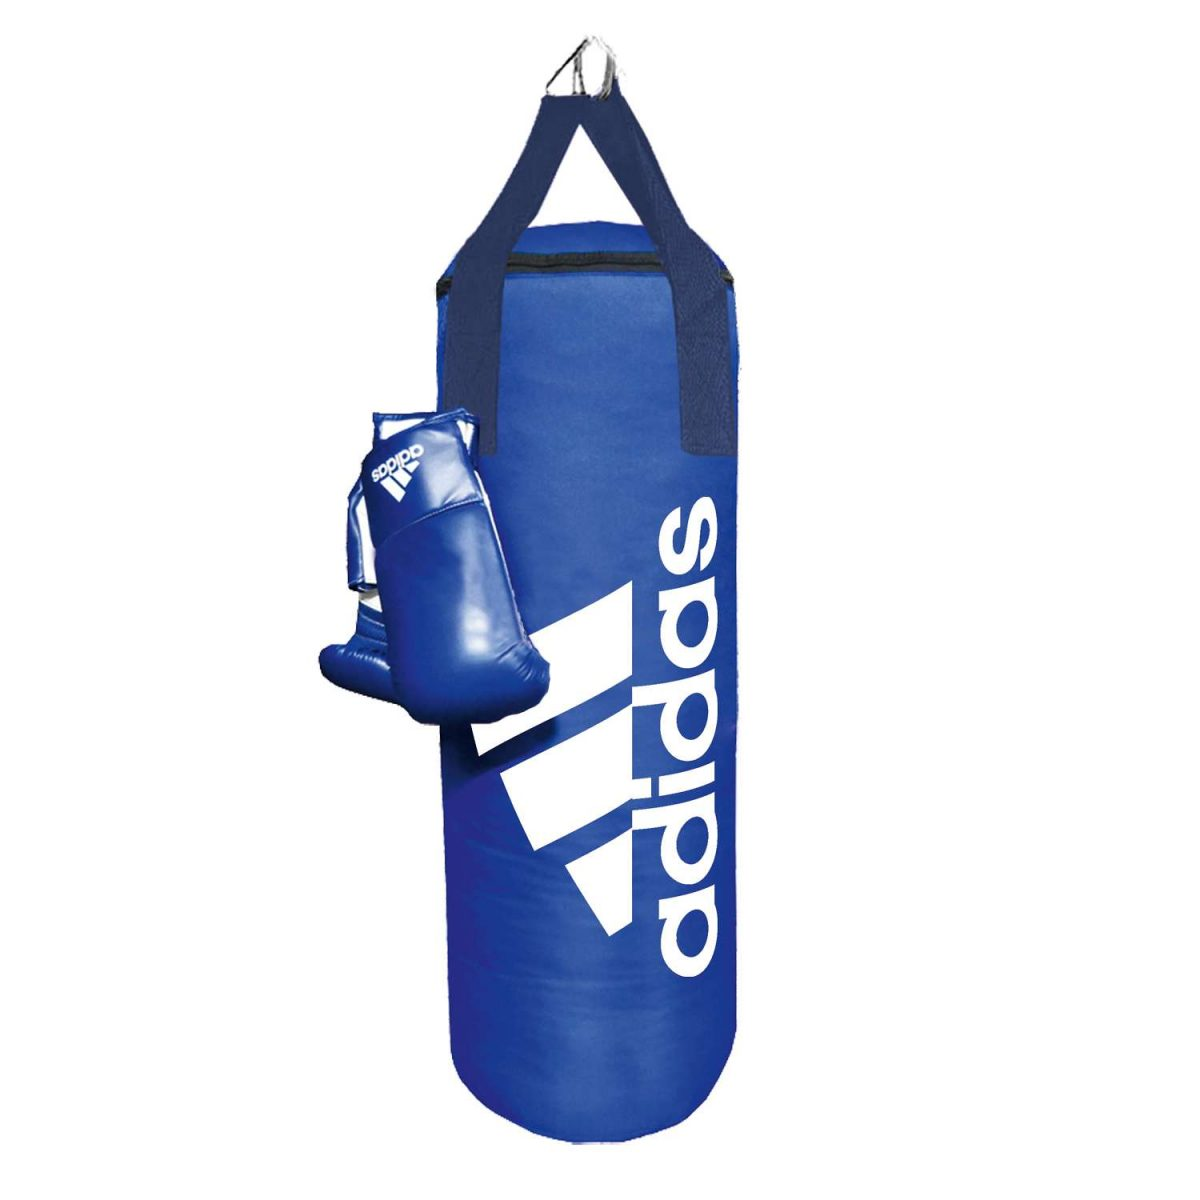 Adidas Blue Corner Boxing Kit - Fitnessgeräte - Adidas